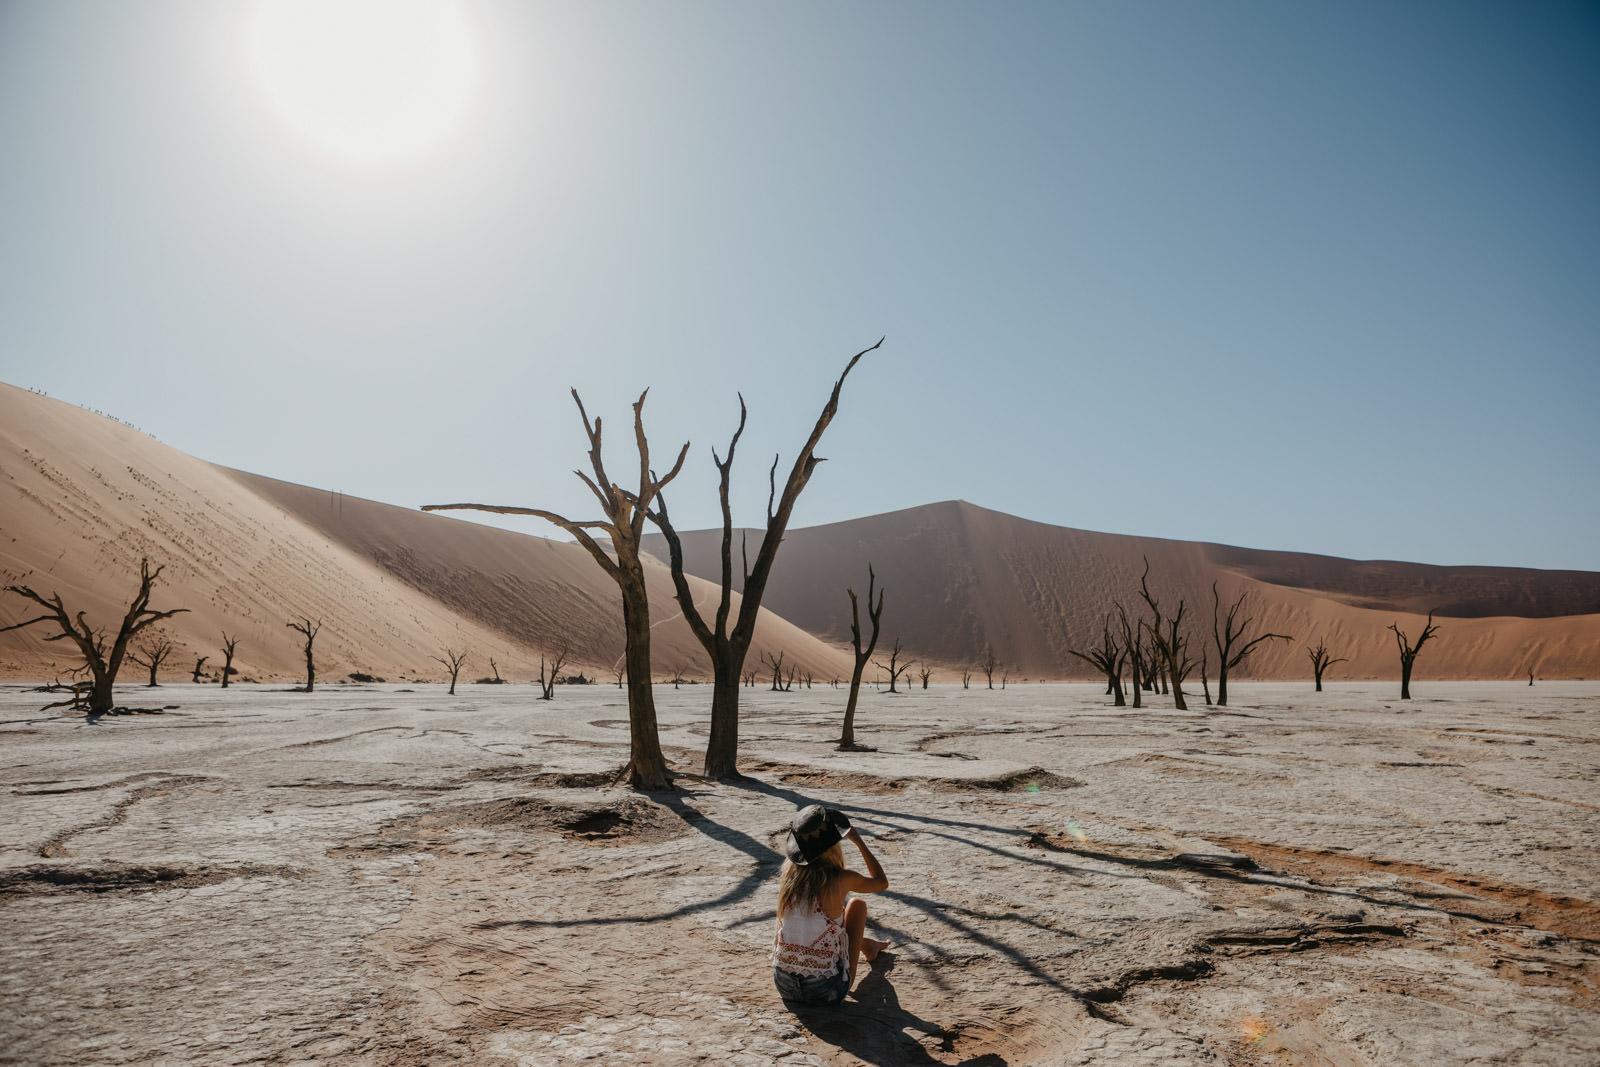 namibia_trip_rooftent_camping_roadtrip (20 von 26).jpg